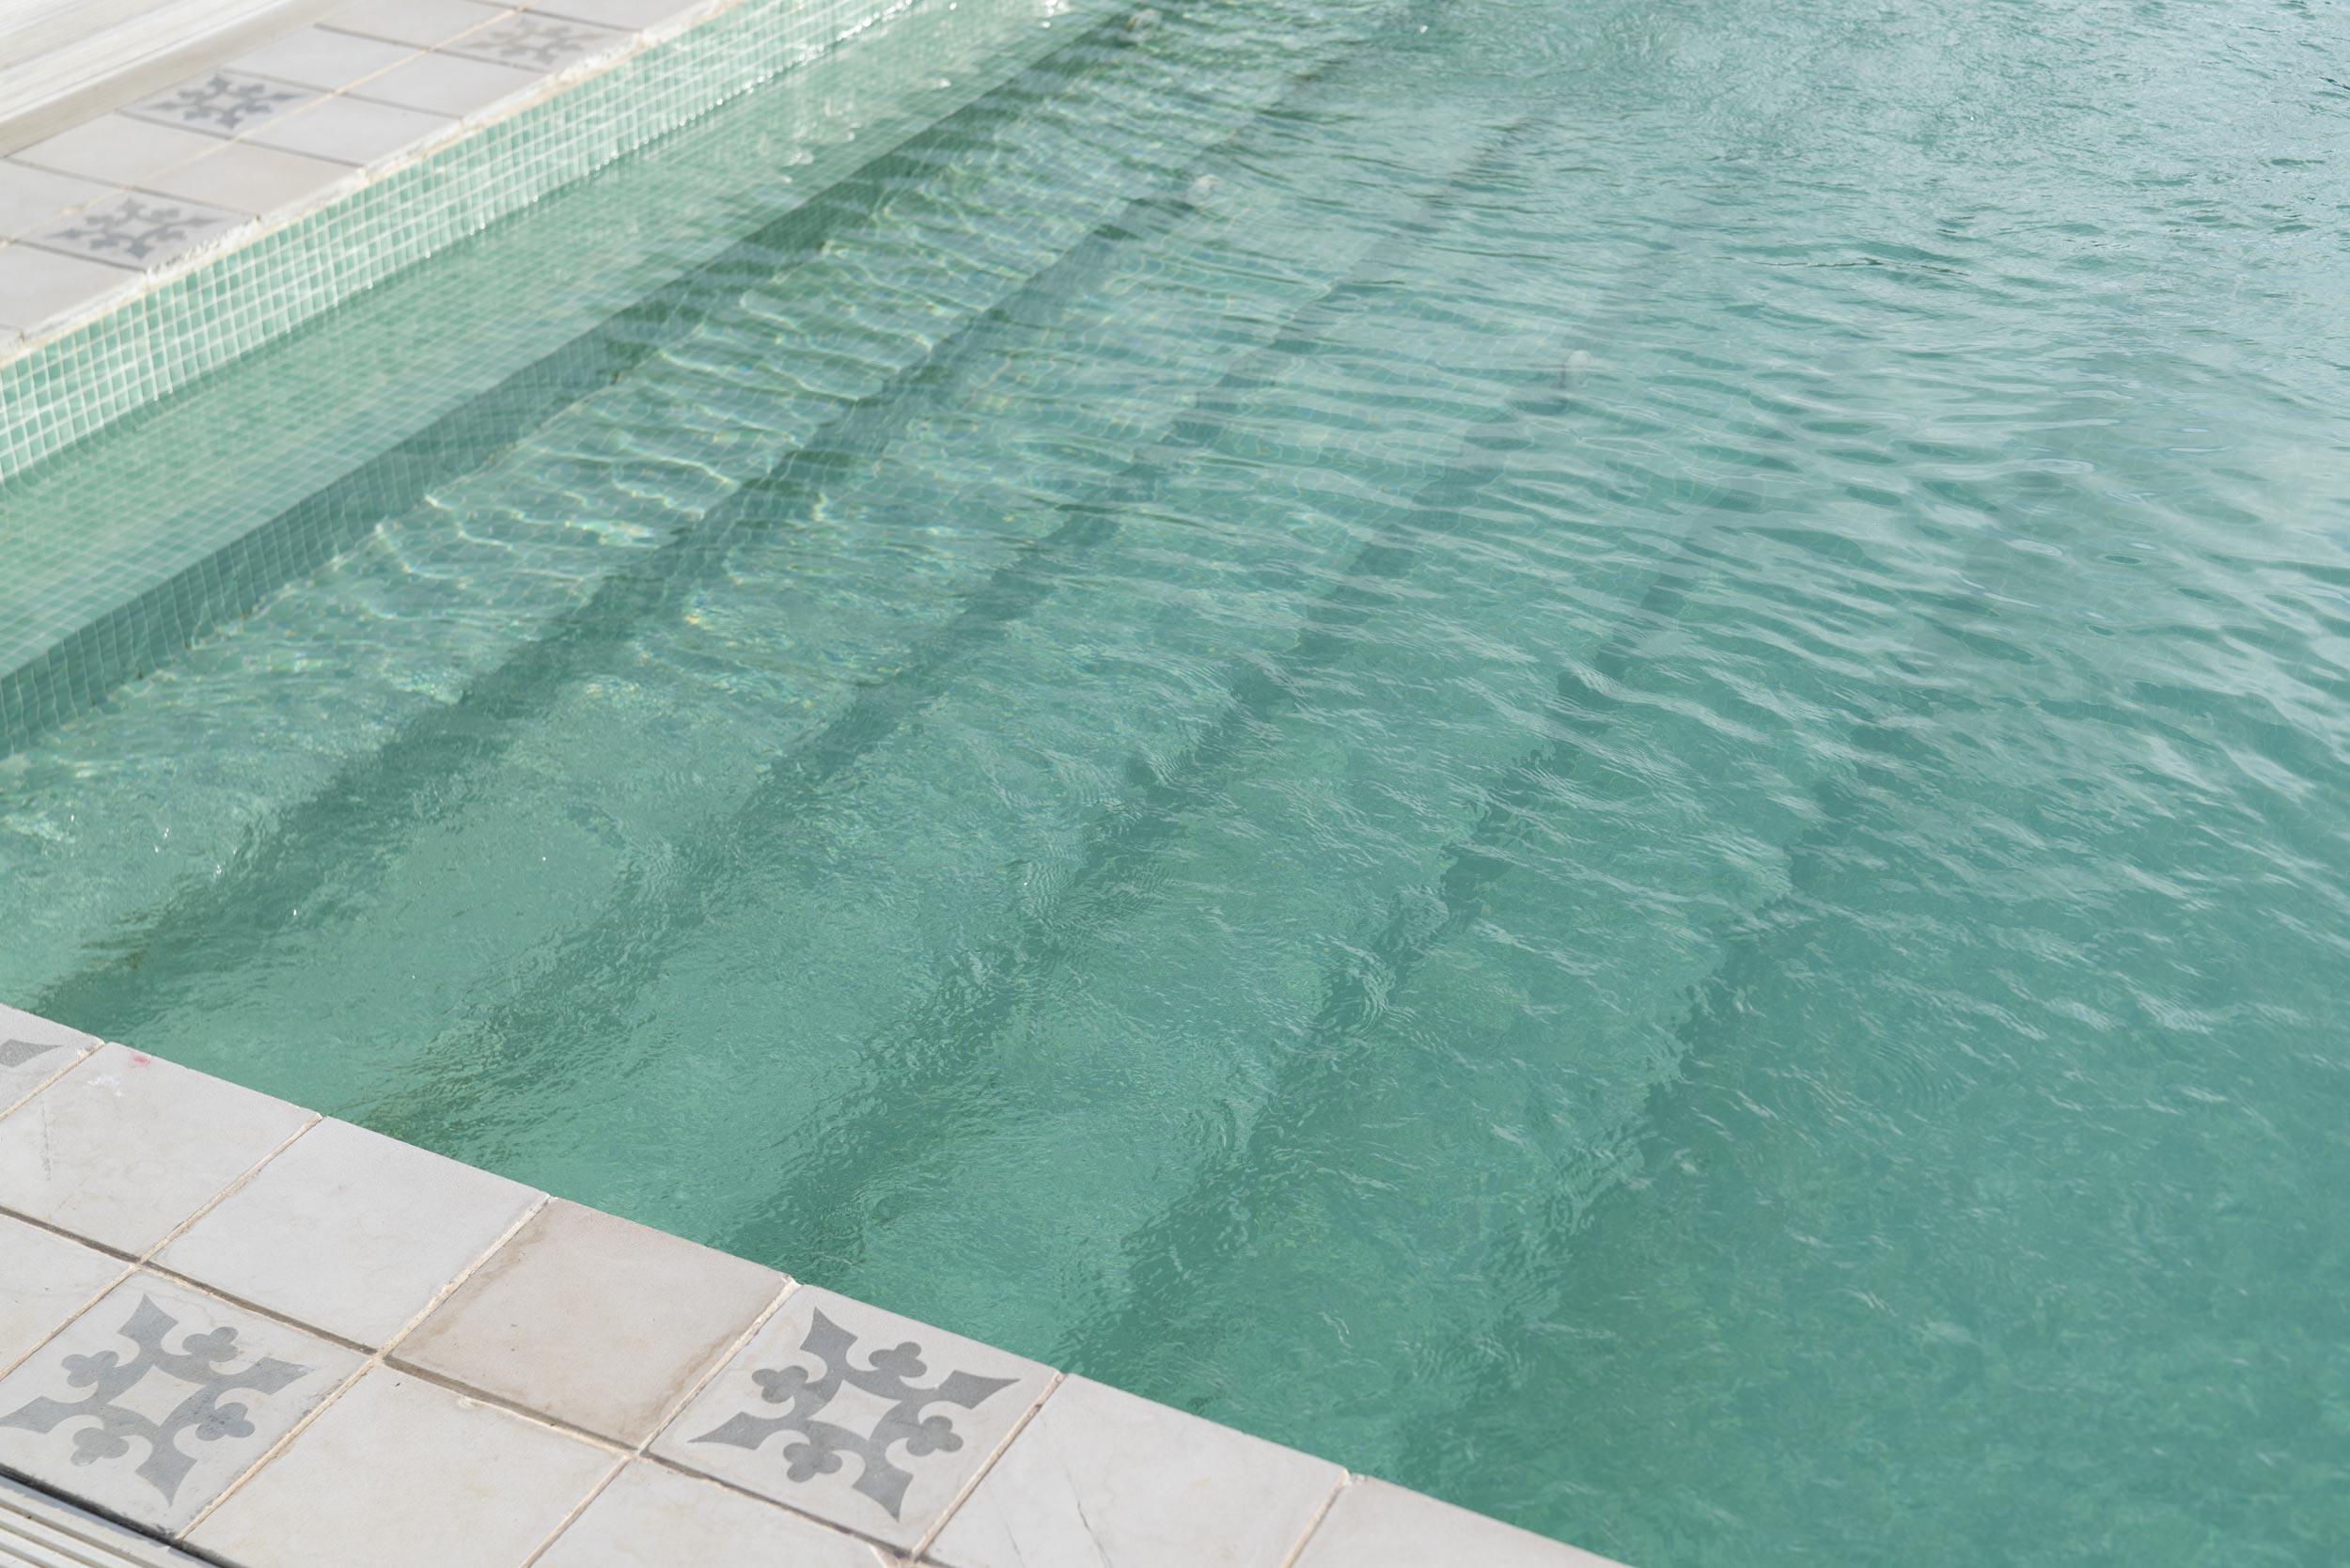 Casa-La-Siesta-Spain-Fiona-Burrage-Photography-swimming-pool-andalucia.jpeg